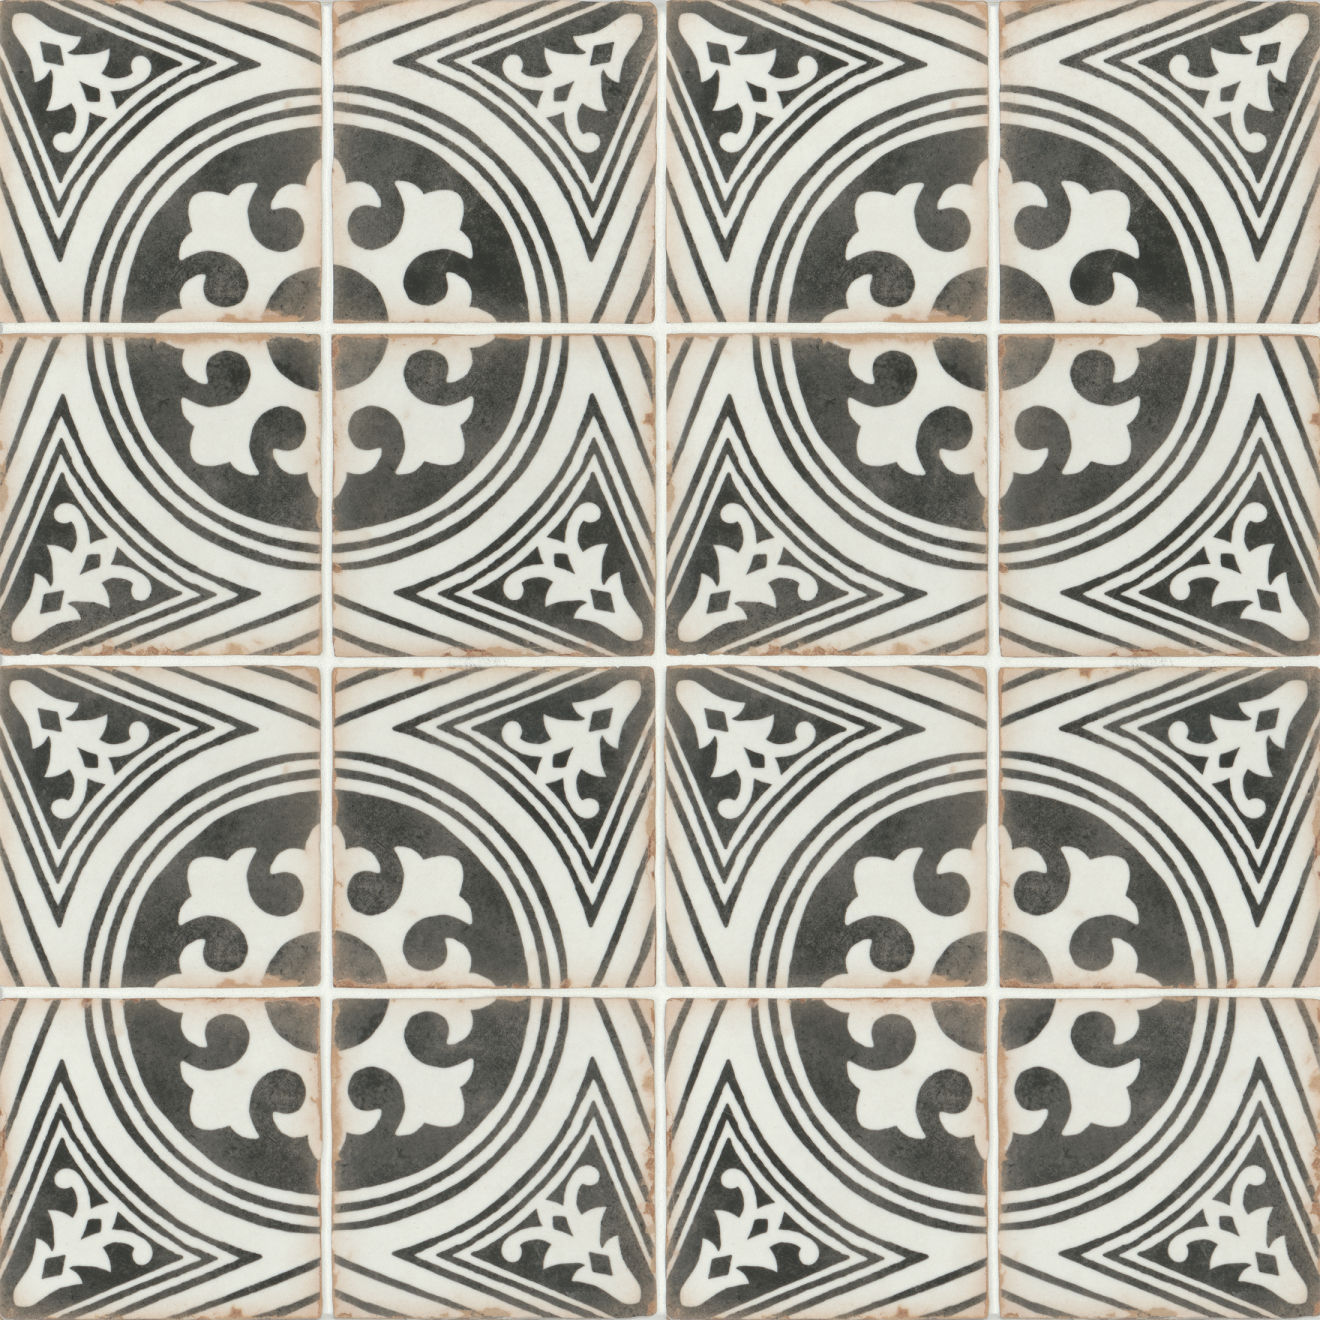 "Casablanca 5"" x 5"" Matte Ceramic Floor and Wall Tile in Fida"